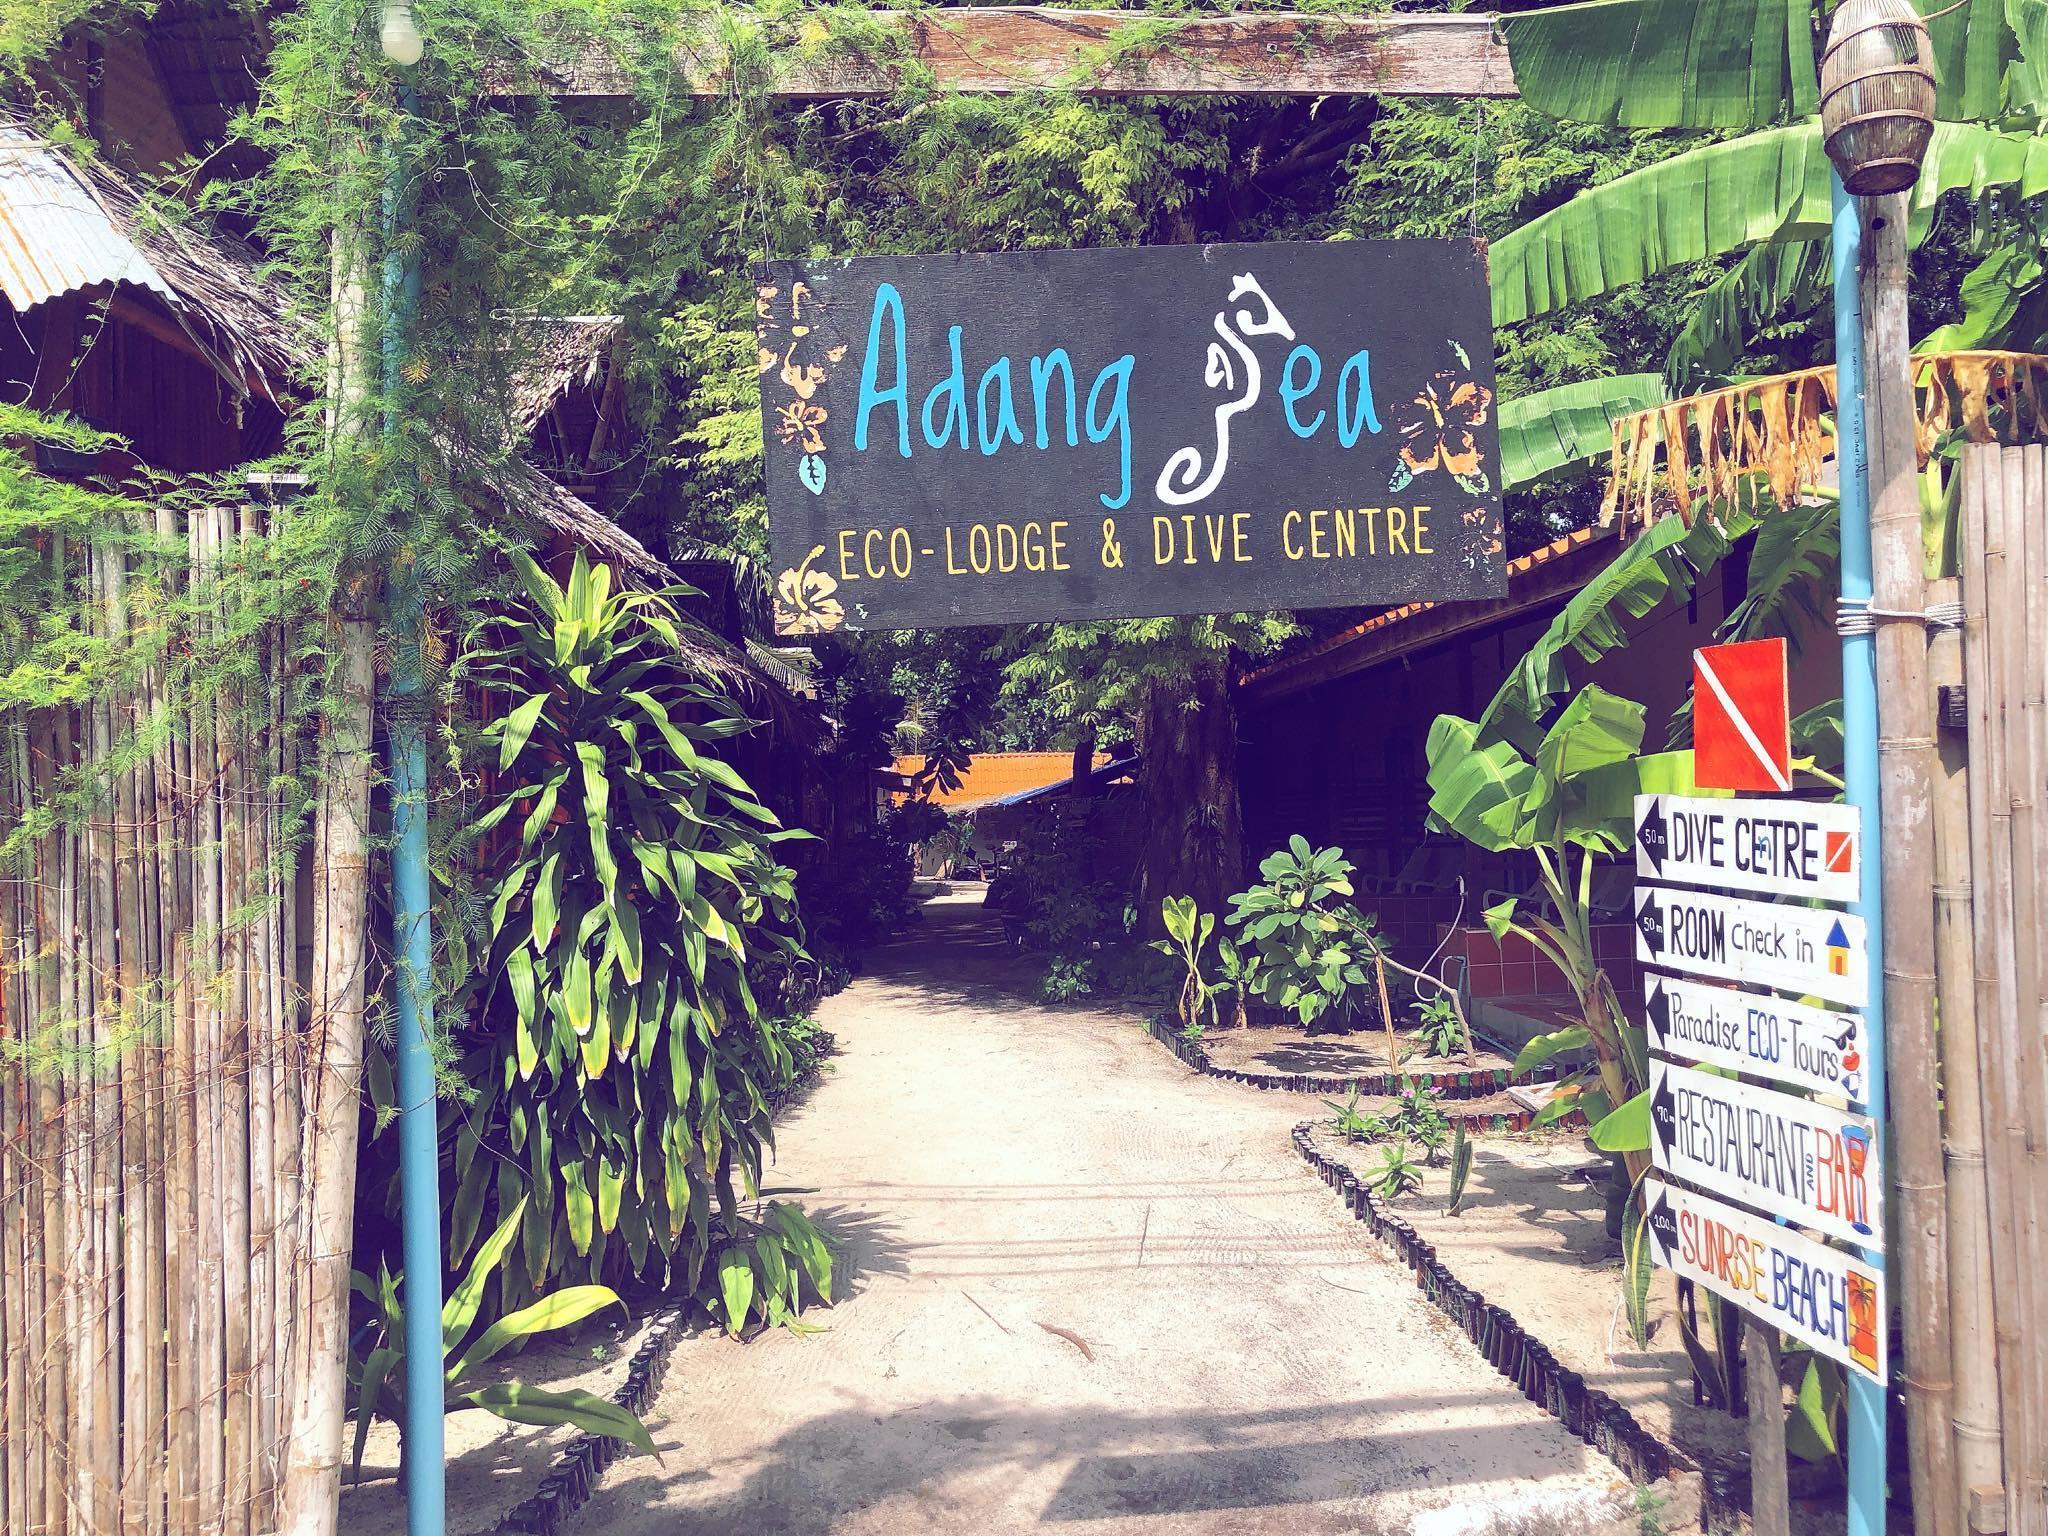 Adang Sea Divers And Eco Lodge